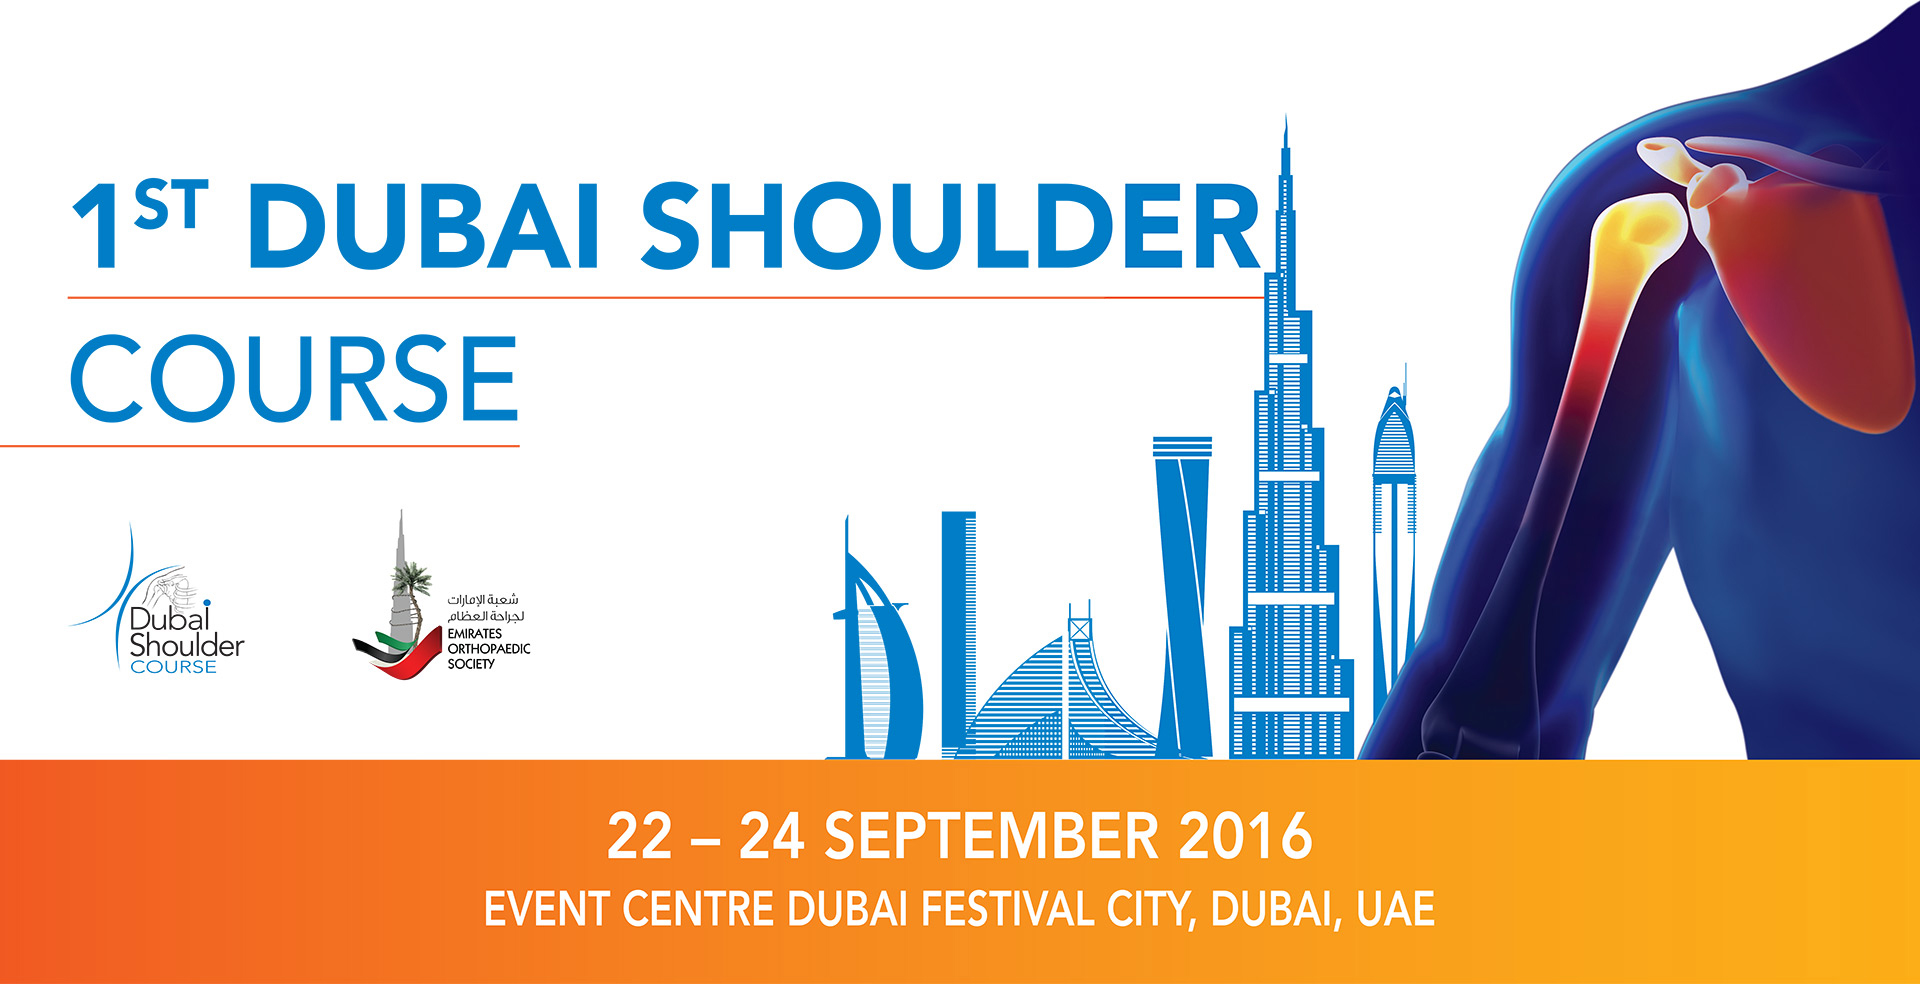 Dubai shoulder